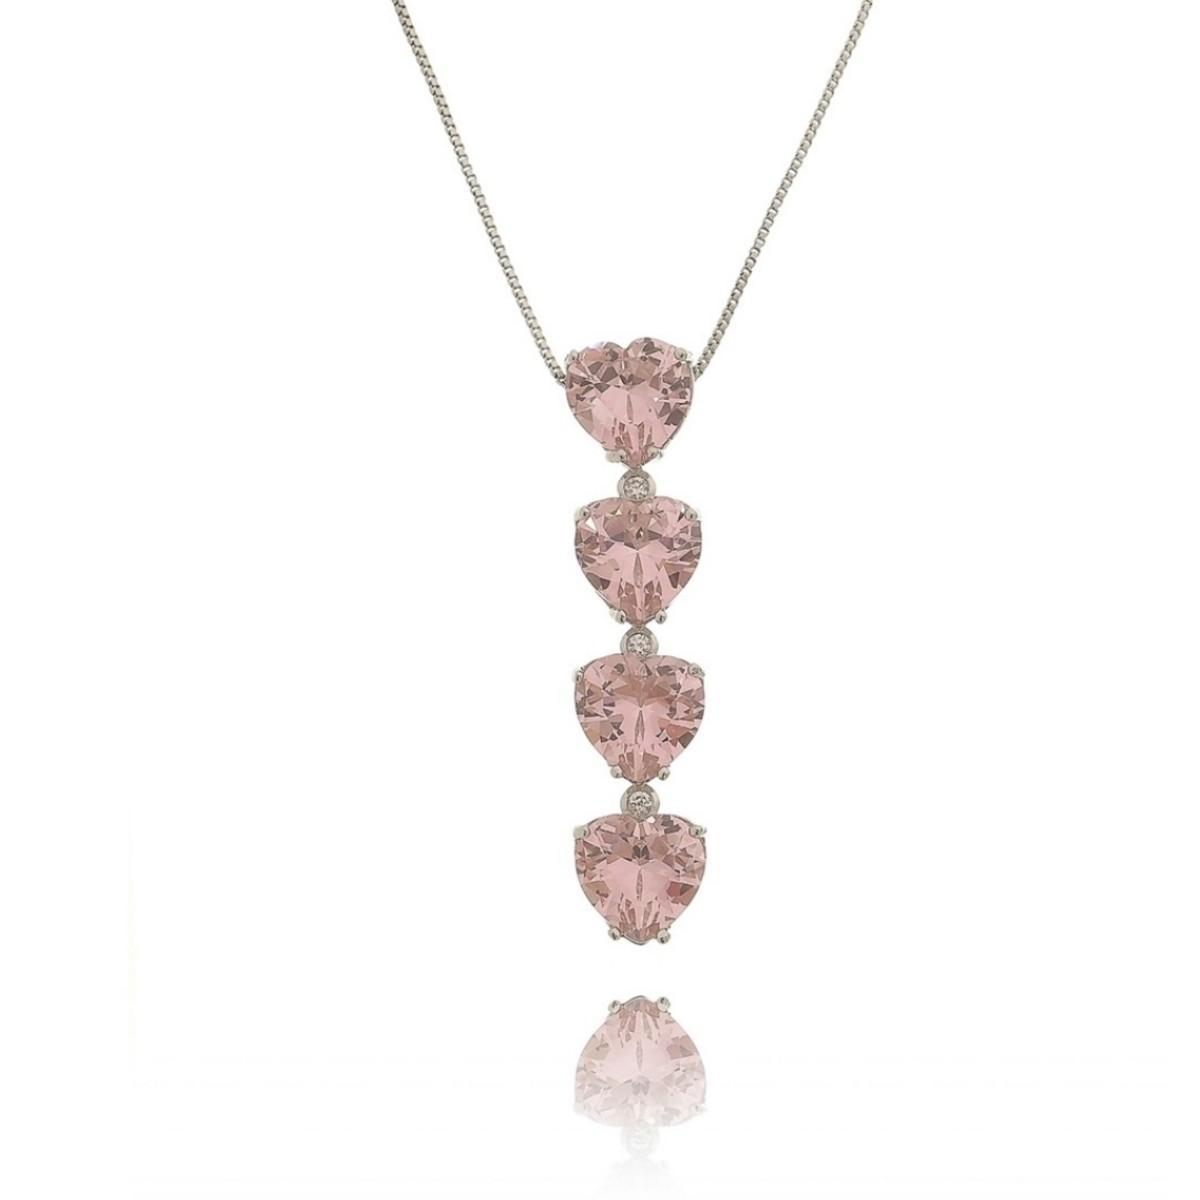 Colar Delicado Gravatinha de Coração Rosa Semijoia Exclusiva Ródio Branco com Zircônia Branca  - Soloyou